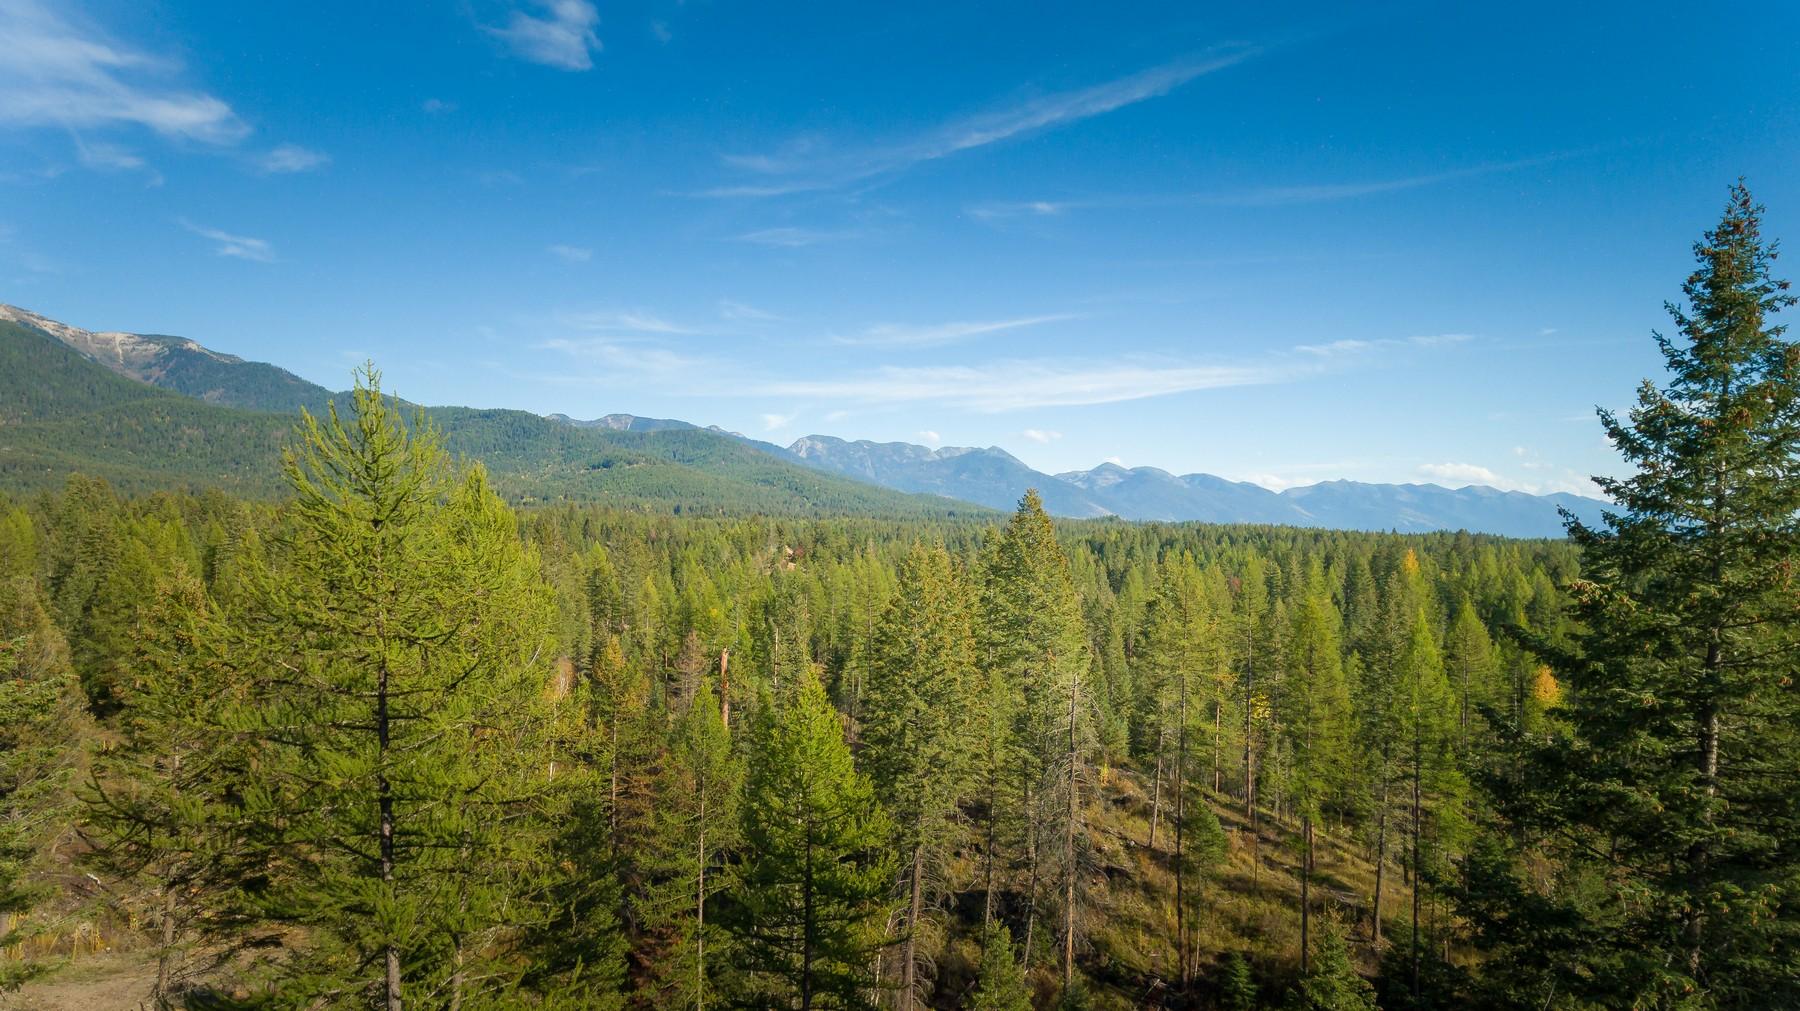 Land for Sale at 395 Kauffman Ln , Kalispell, MT 59901 395 Kauffman Ln Kalispell, Montana, 59901 United States